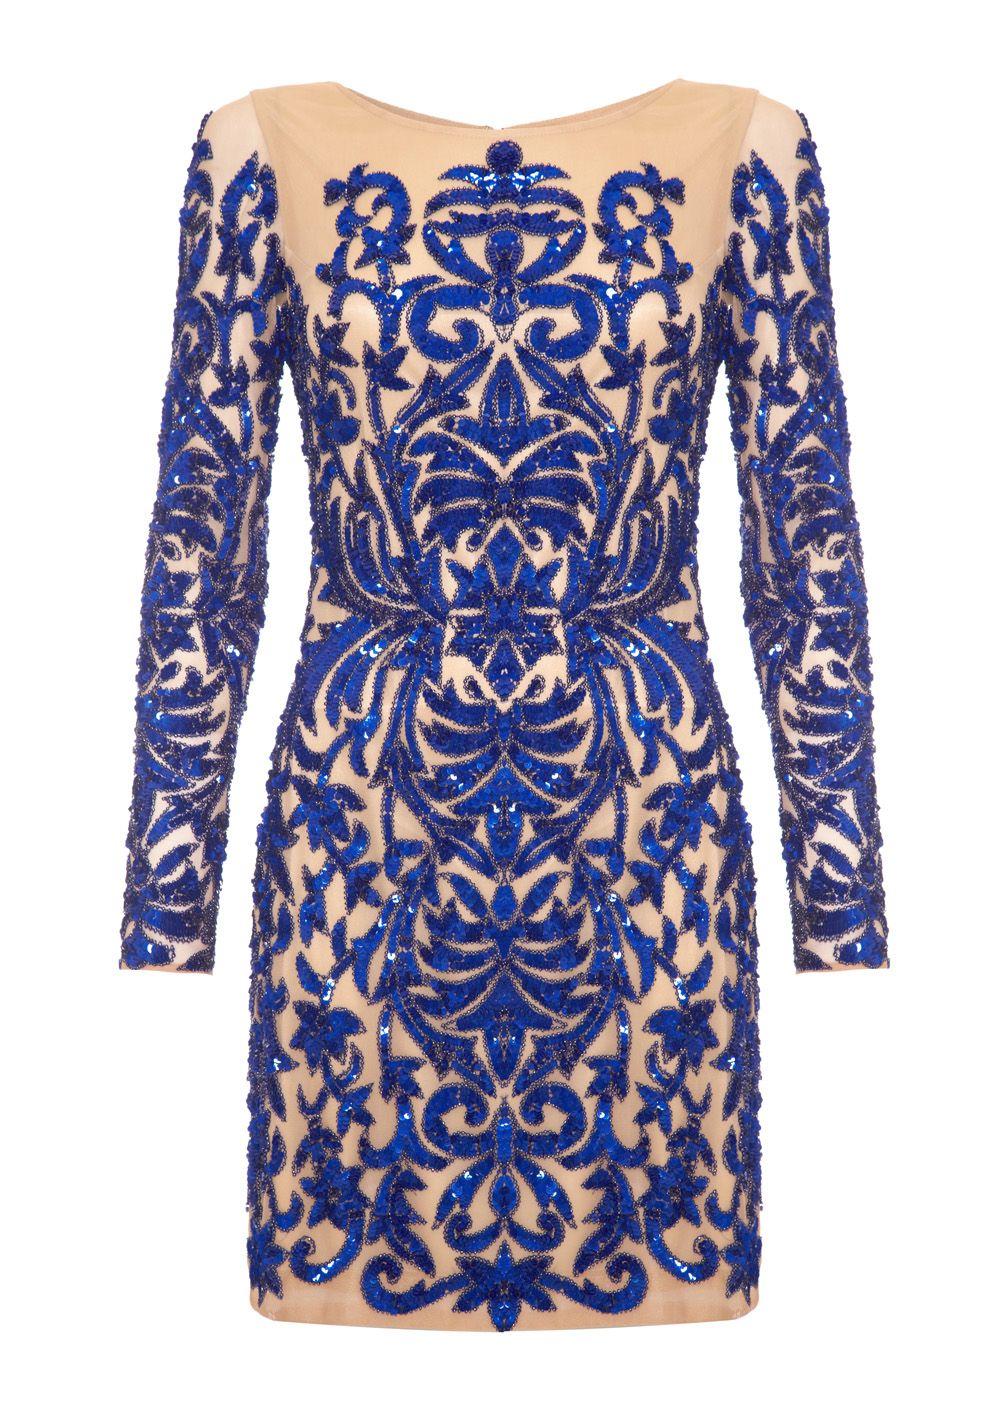 HOLLIES - Blue sequin patterned fully embellished dress | FOREVER ...